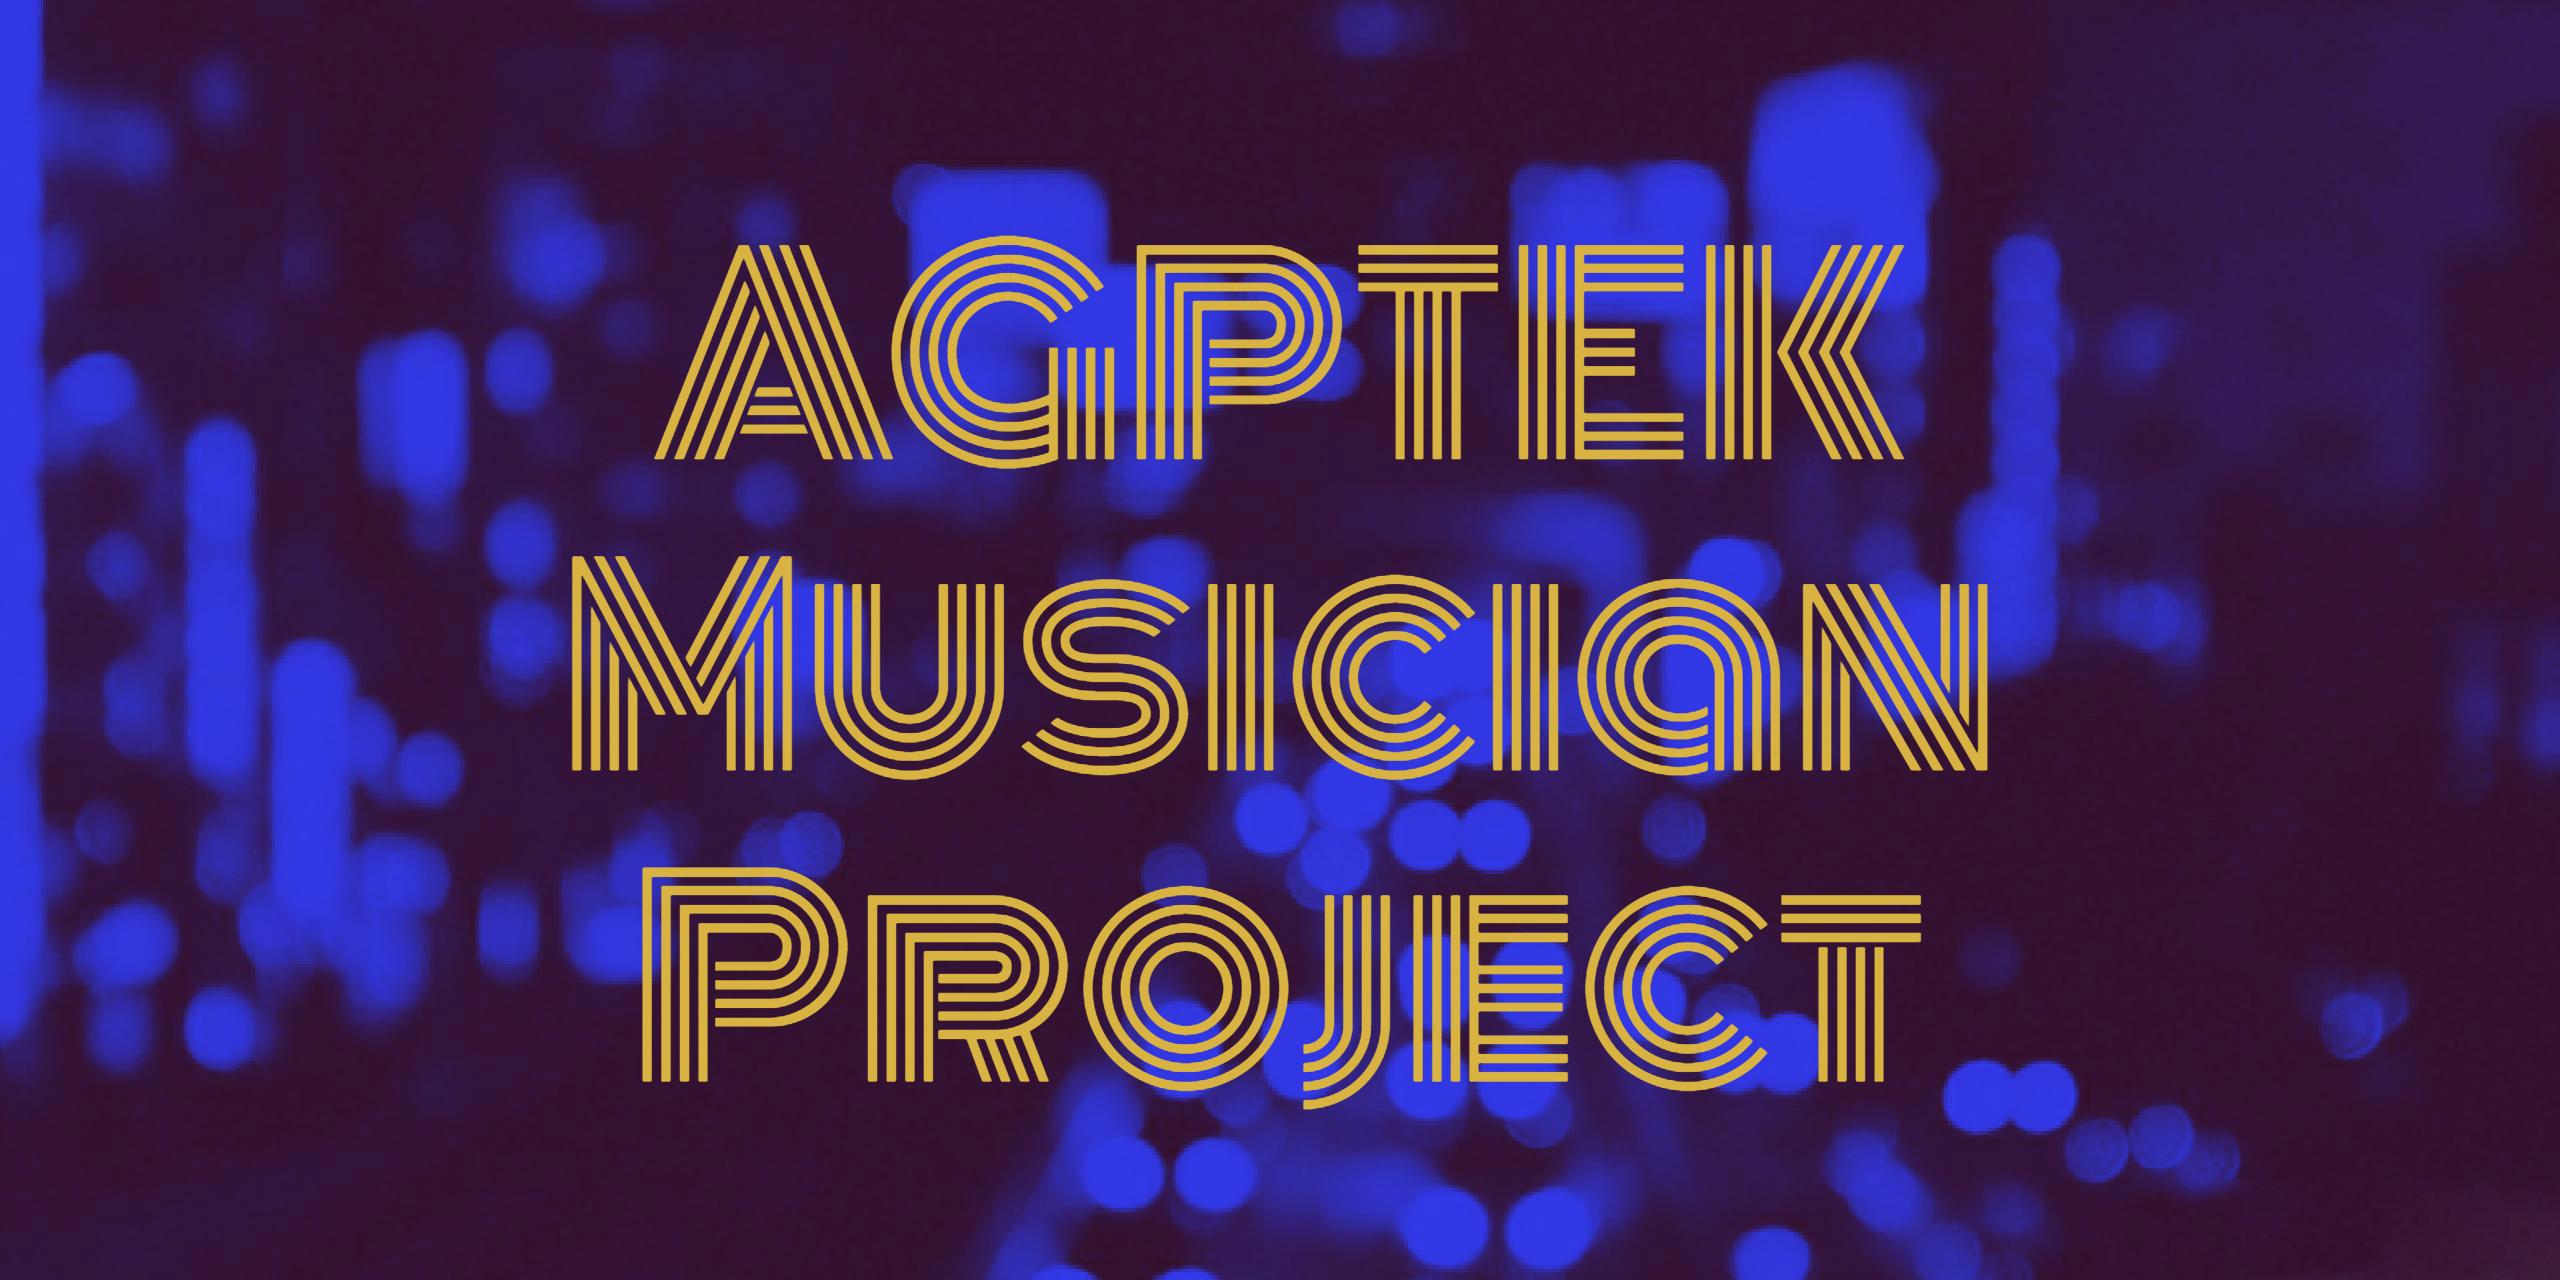 AGPTEK Musician Project